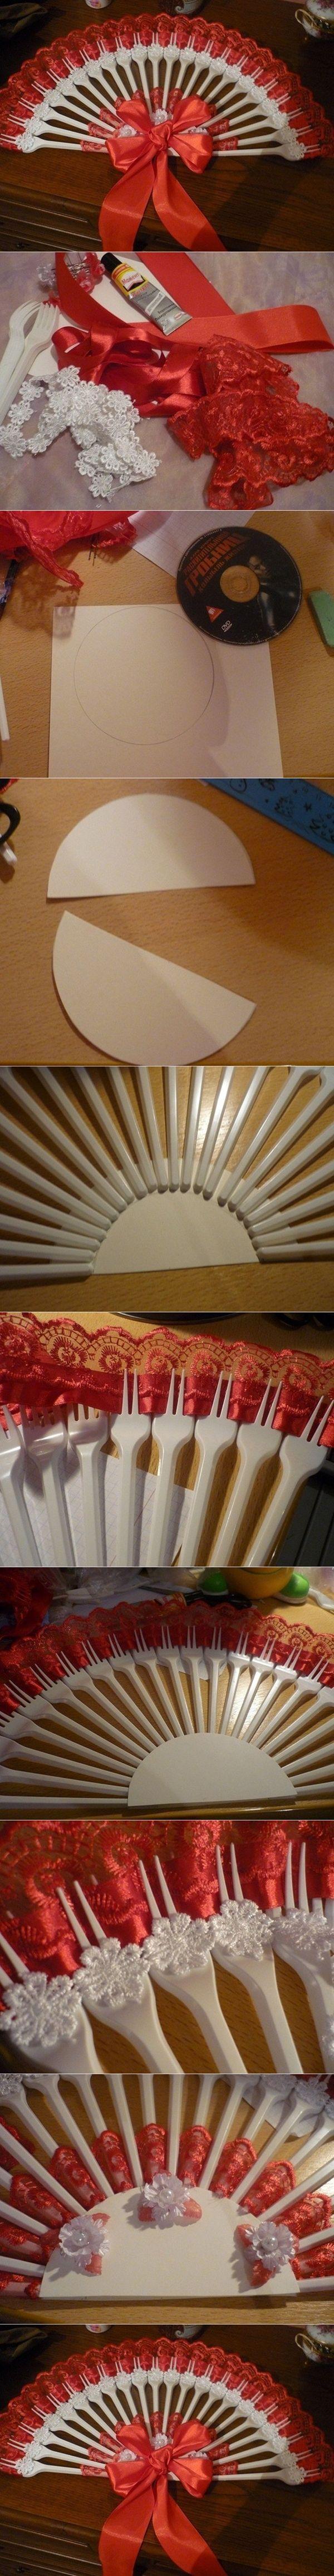 DIY Upcycled Plastic Fork Fan | www.FabArtDIY.com LIKE Us on Facebook ==> https://www.facebook.com/FabArtDIY